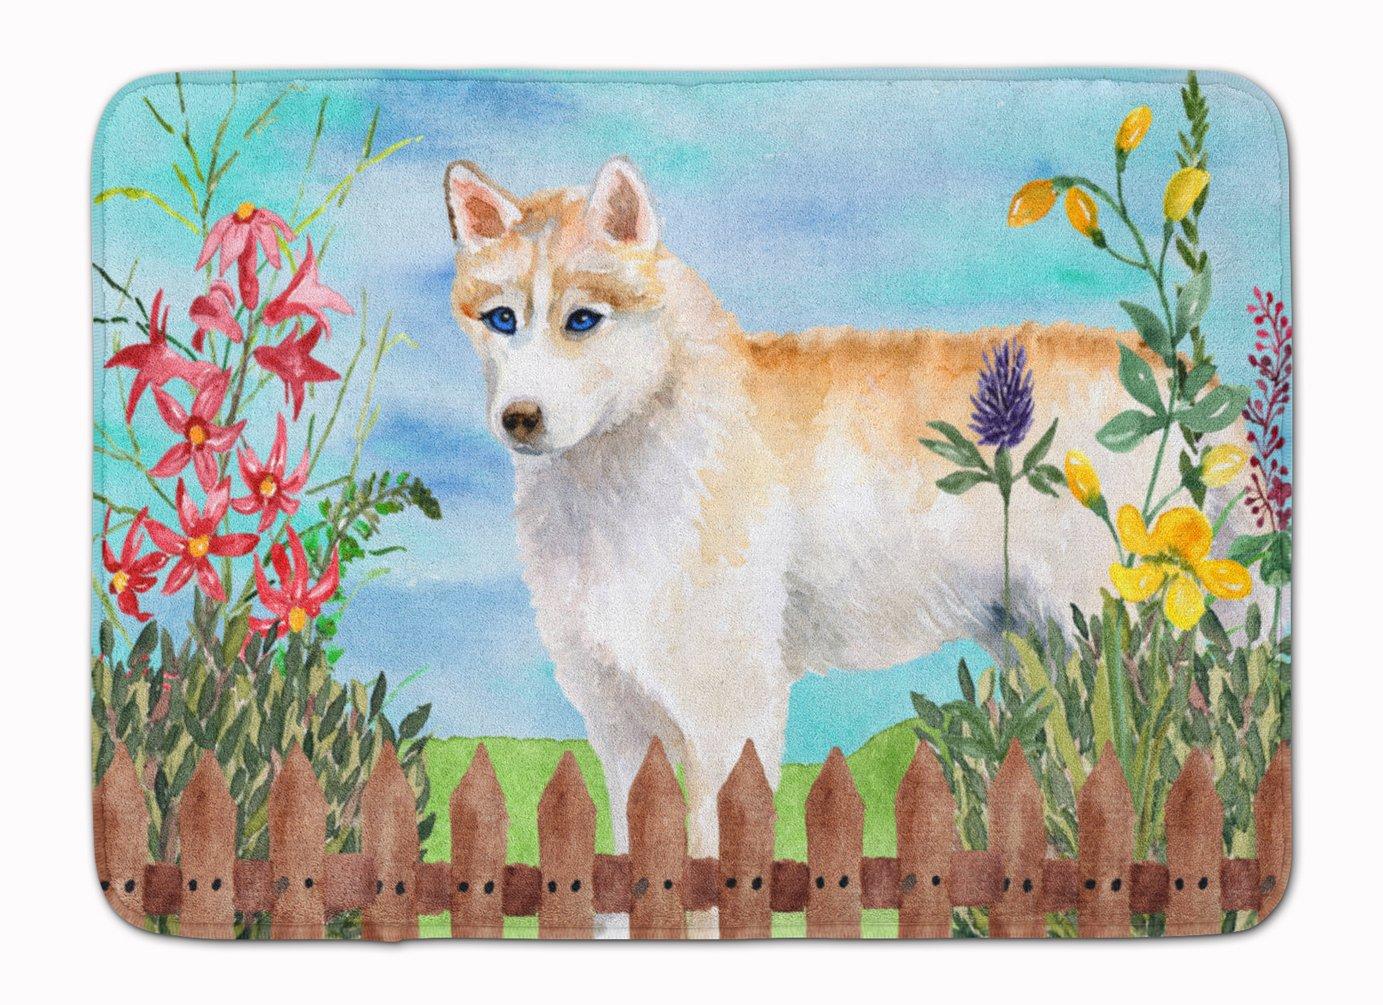 Carolines Treasures Siberian Husky Spring Floor Mat 19 x 27 Multicolor